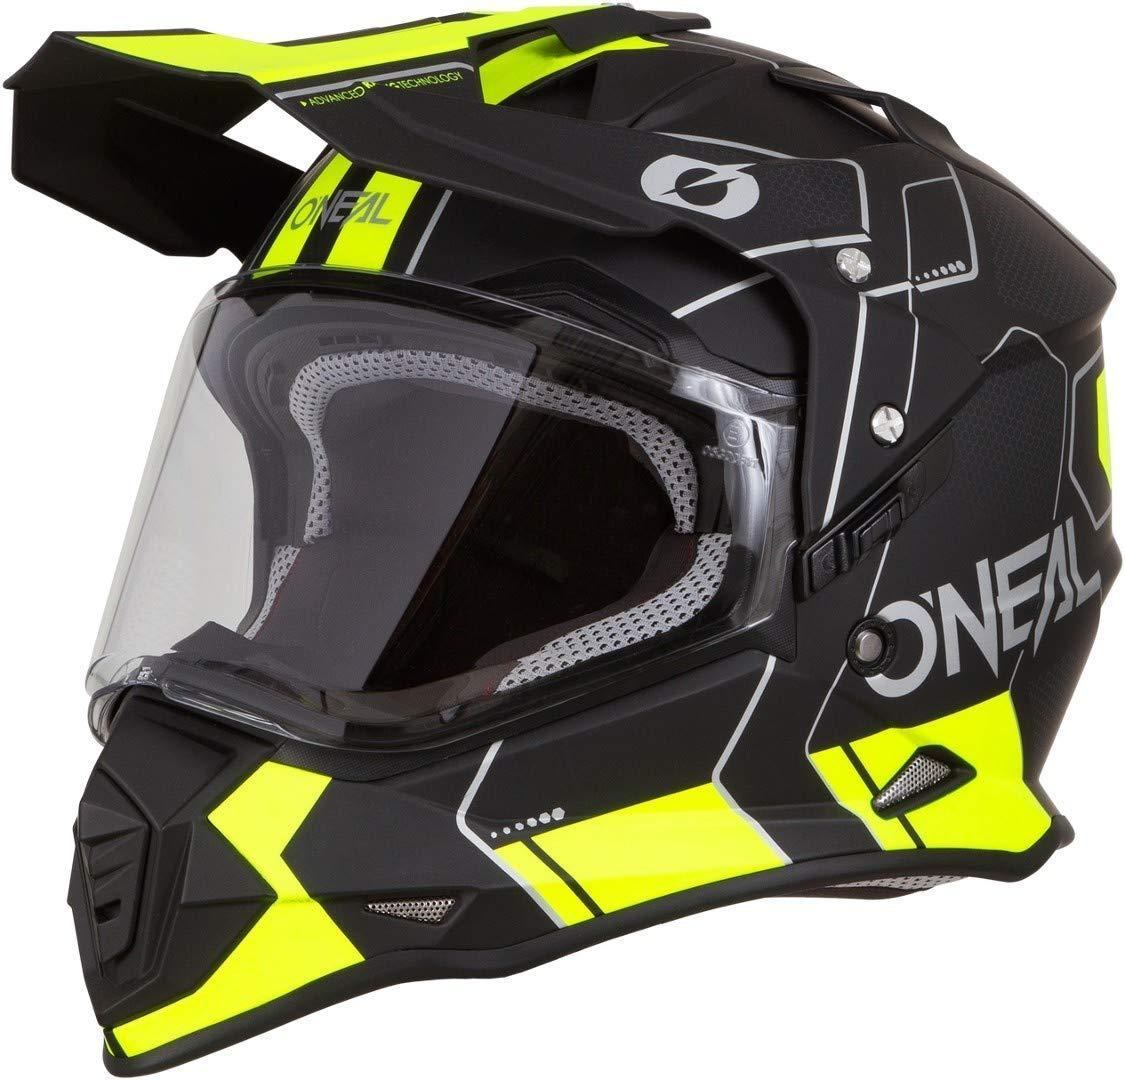 O Neal Sierra IiヘルメットコームMXヘルメットLブラック/ネオンイエロー   B07FD7F2W6